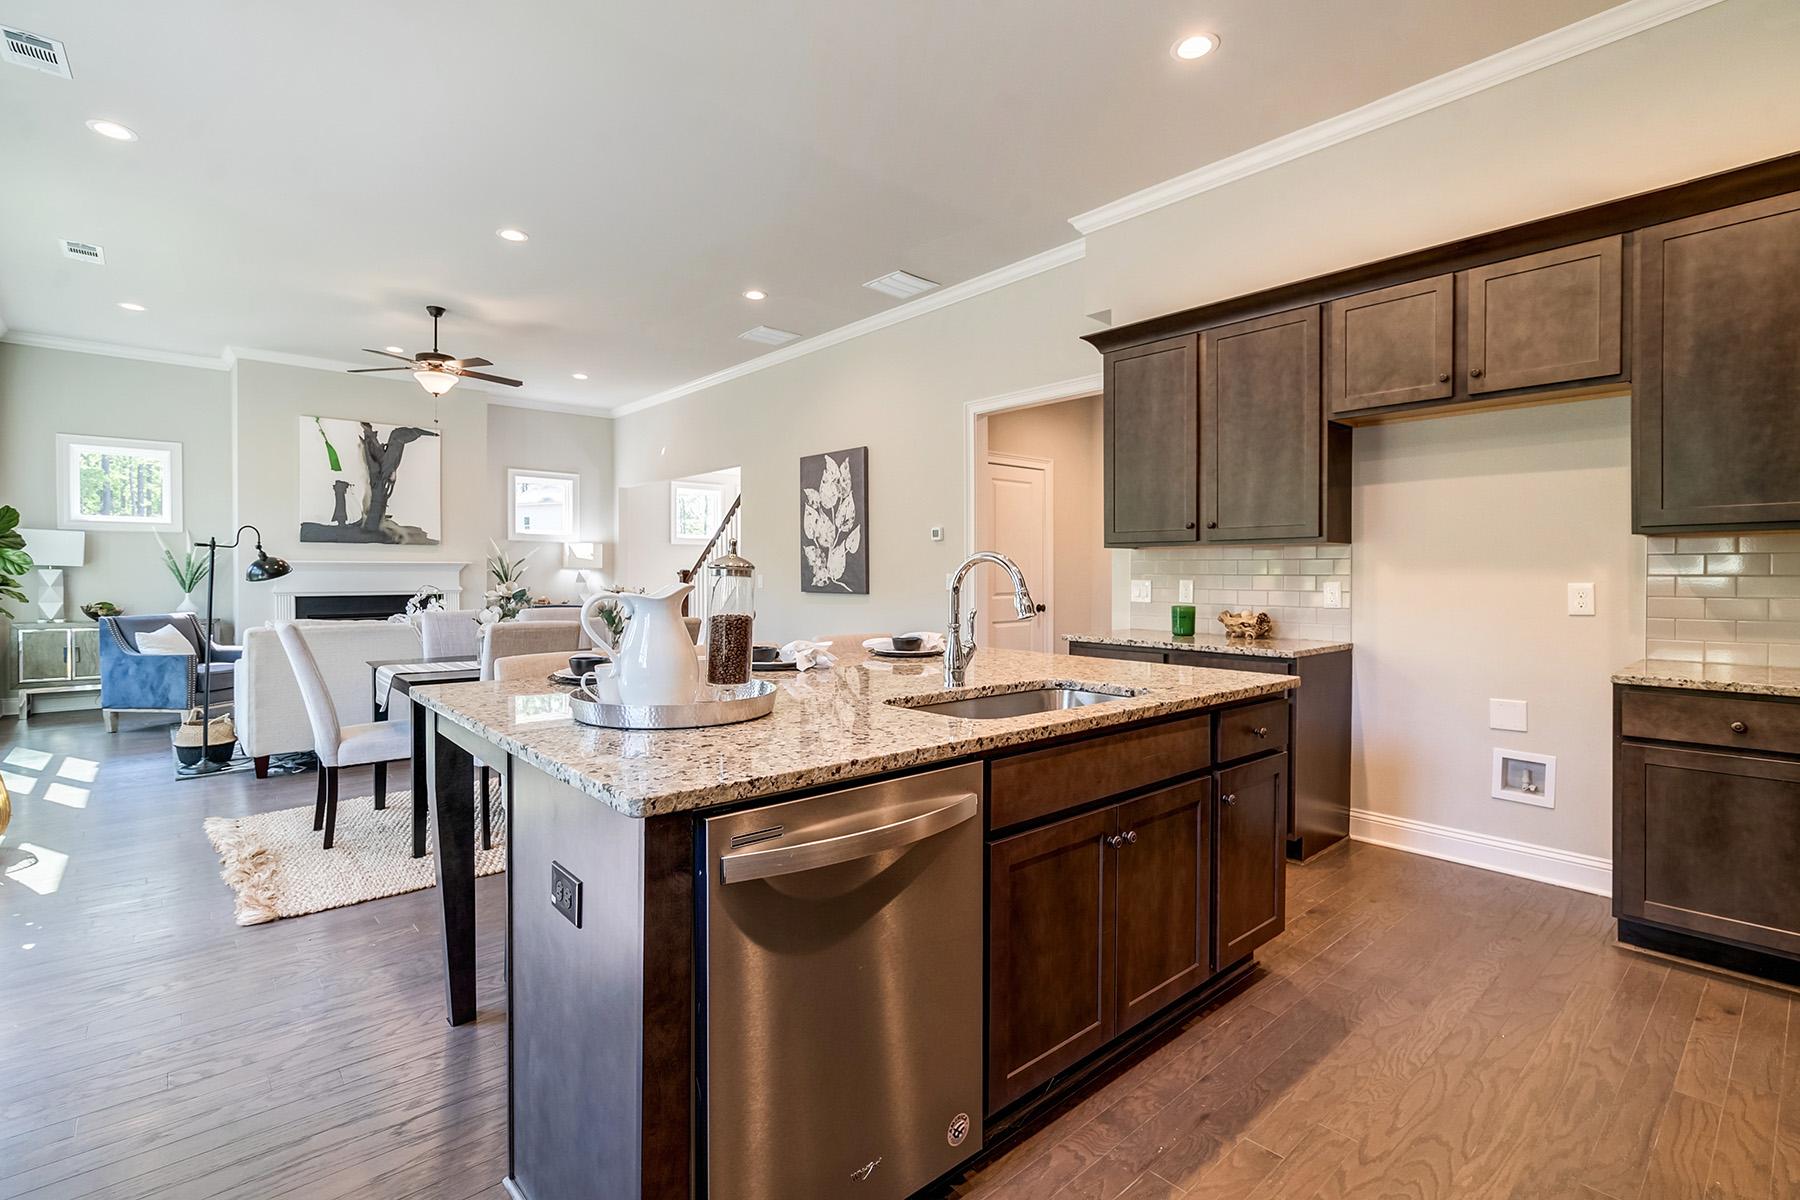 Additional photo for property listing at Retreat At Oak Grove - New Community In Cherokee County 124 Oakdale Woods Lane, Acworth, Georgia 30102 Stati Uniti